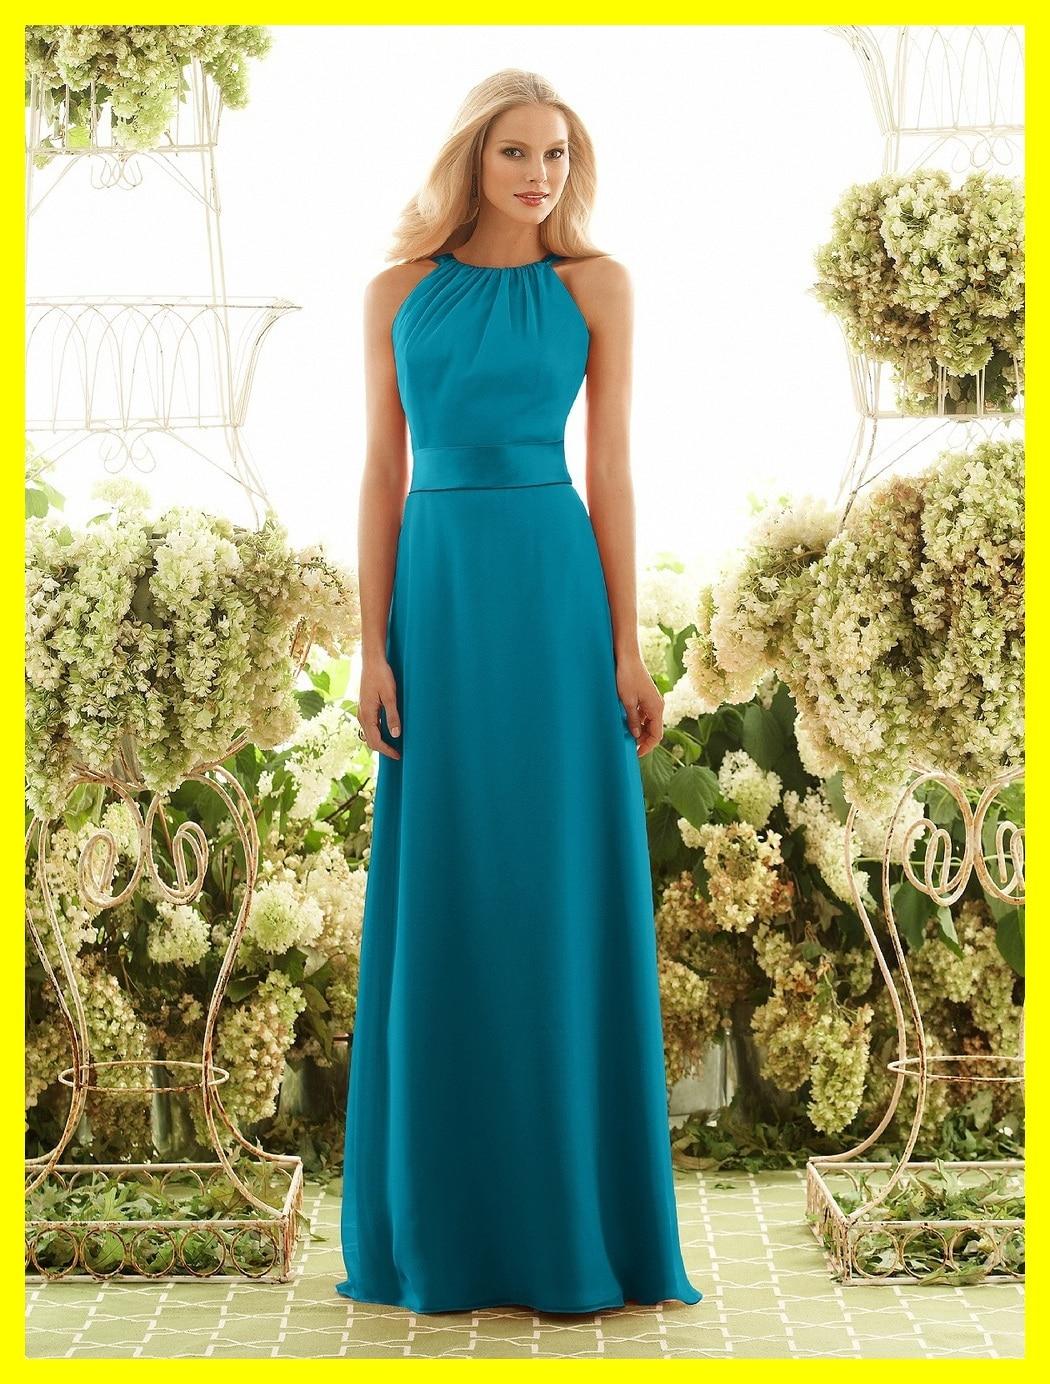 Attractive Green And Orange Bridesmaid Dresses Vignette - All ...